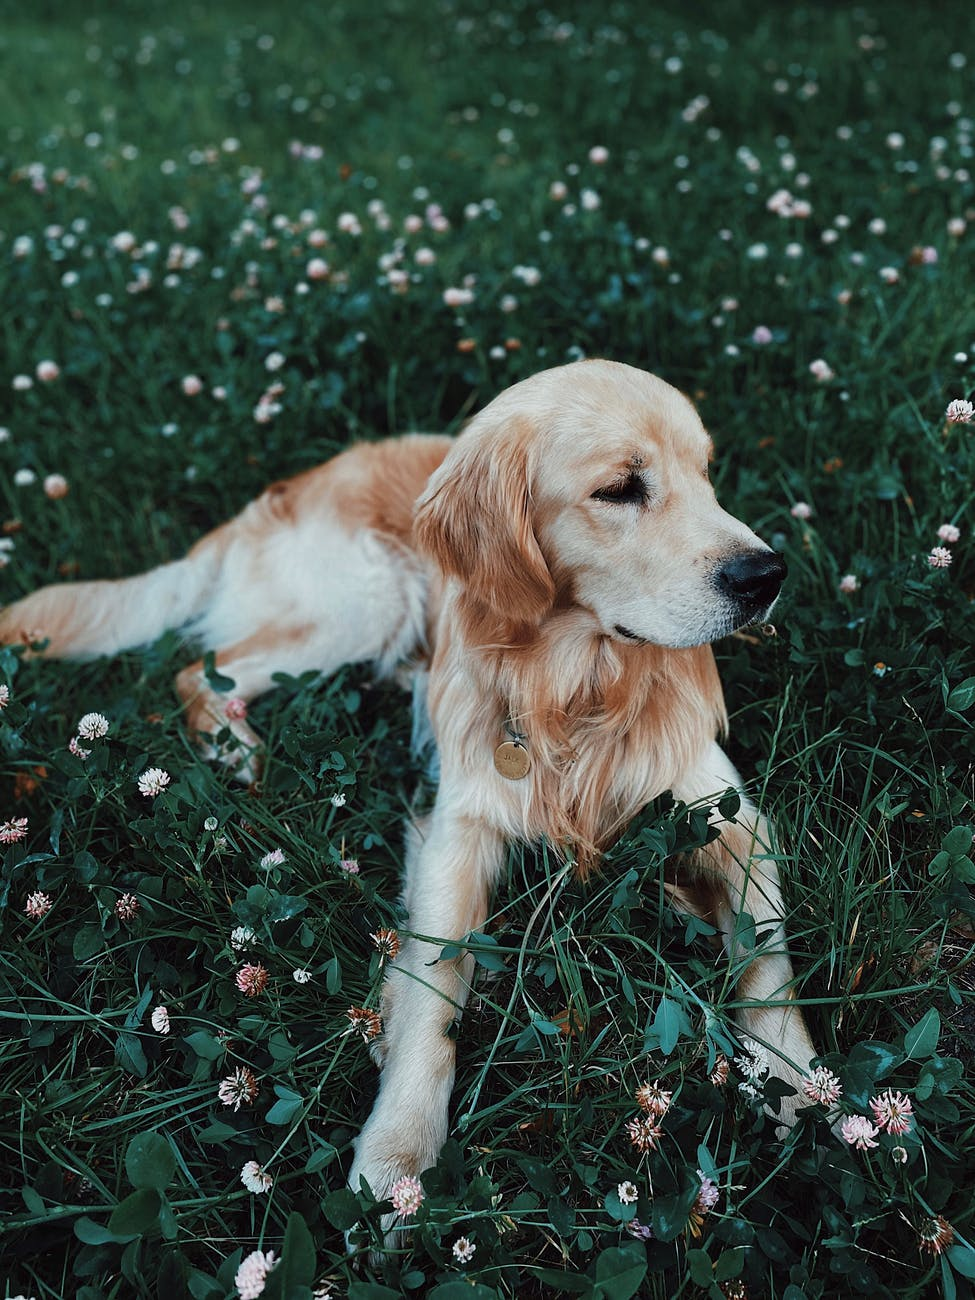 adorable golden retriever lying on verdant field